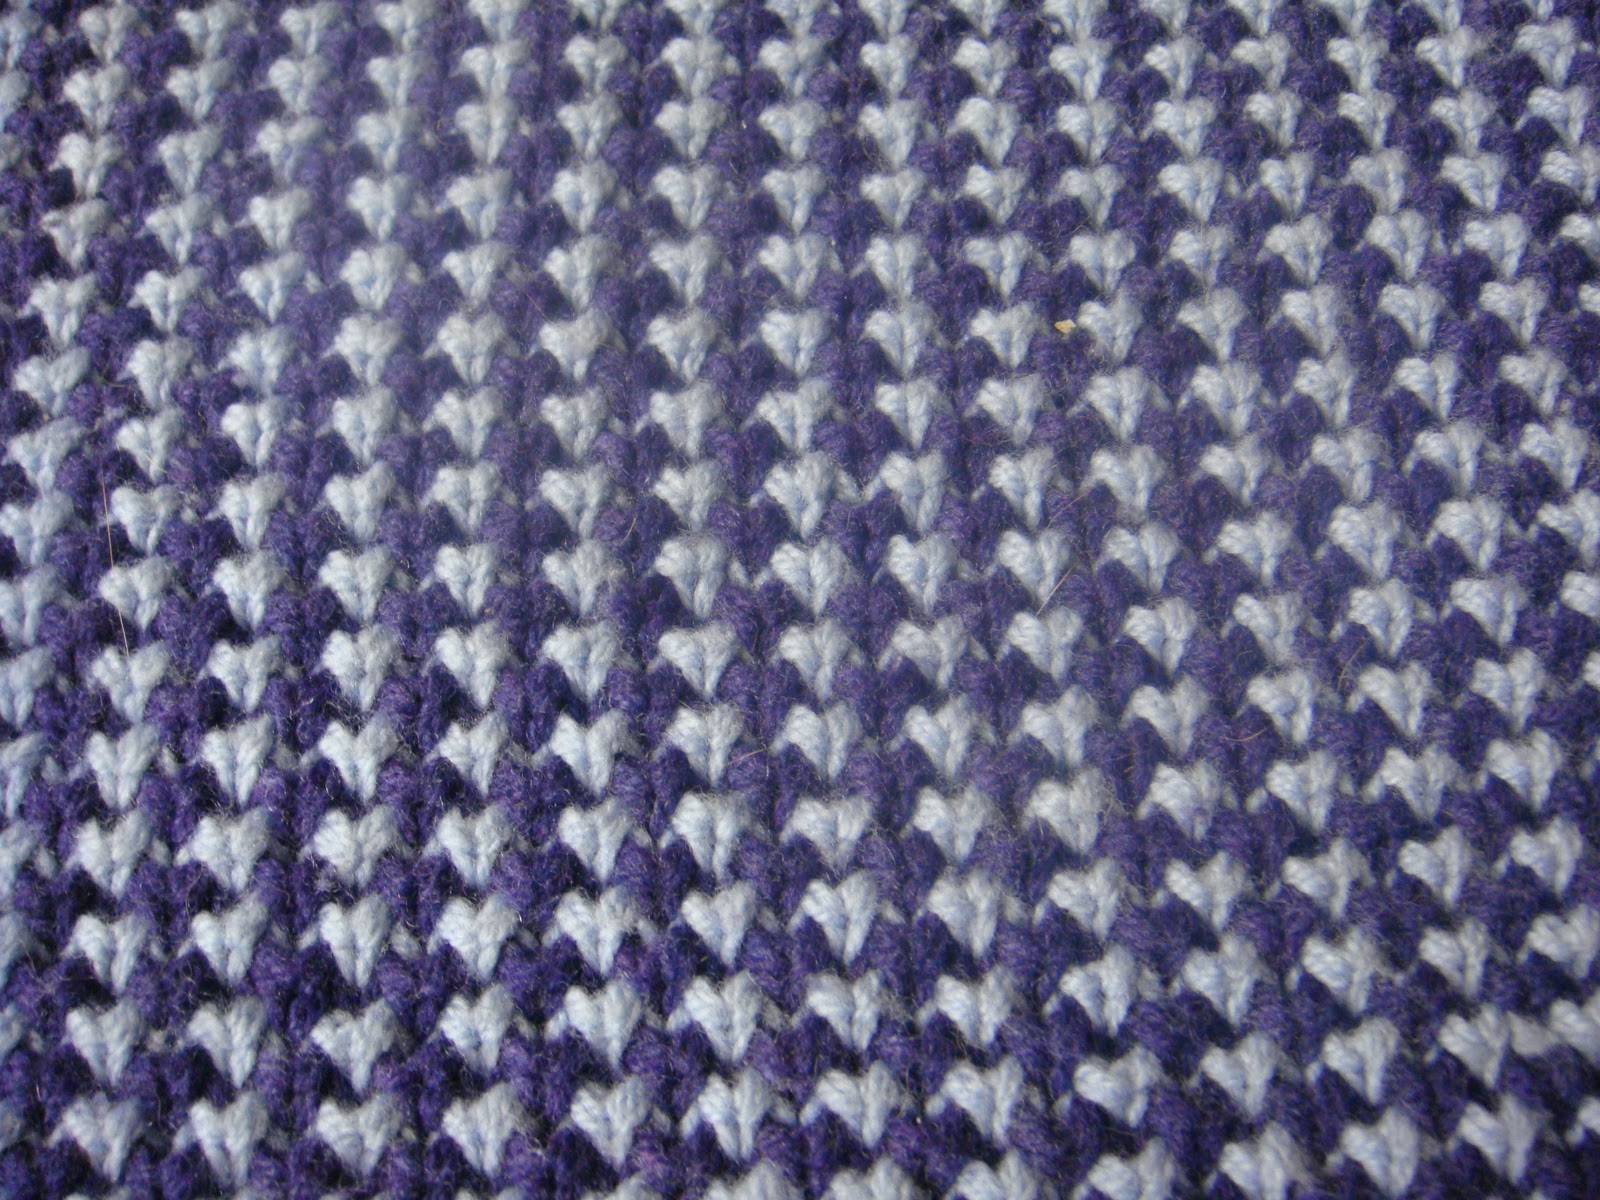 Knit Stitch One Row Below : tatknitcat: Knitting: Herringbone stitch